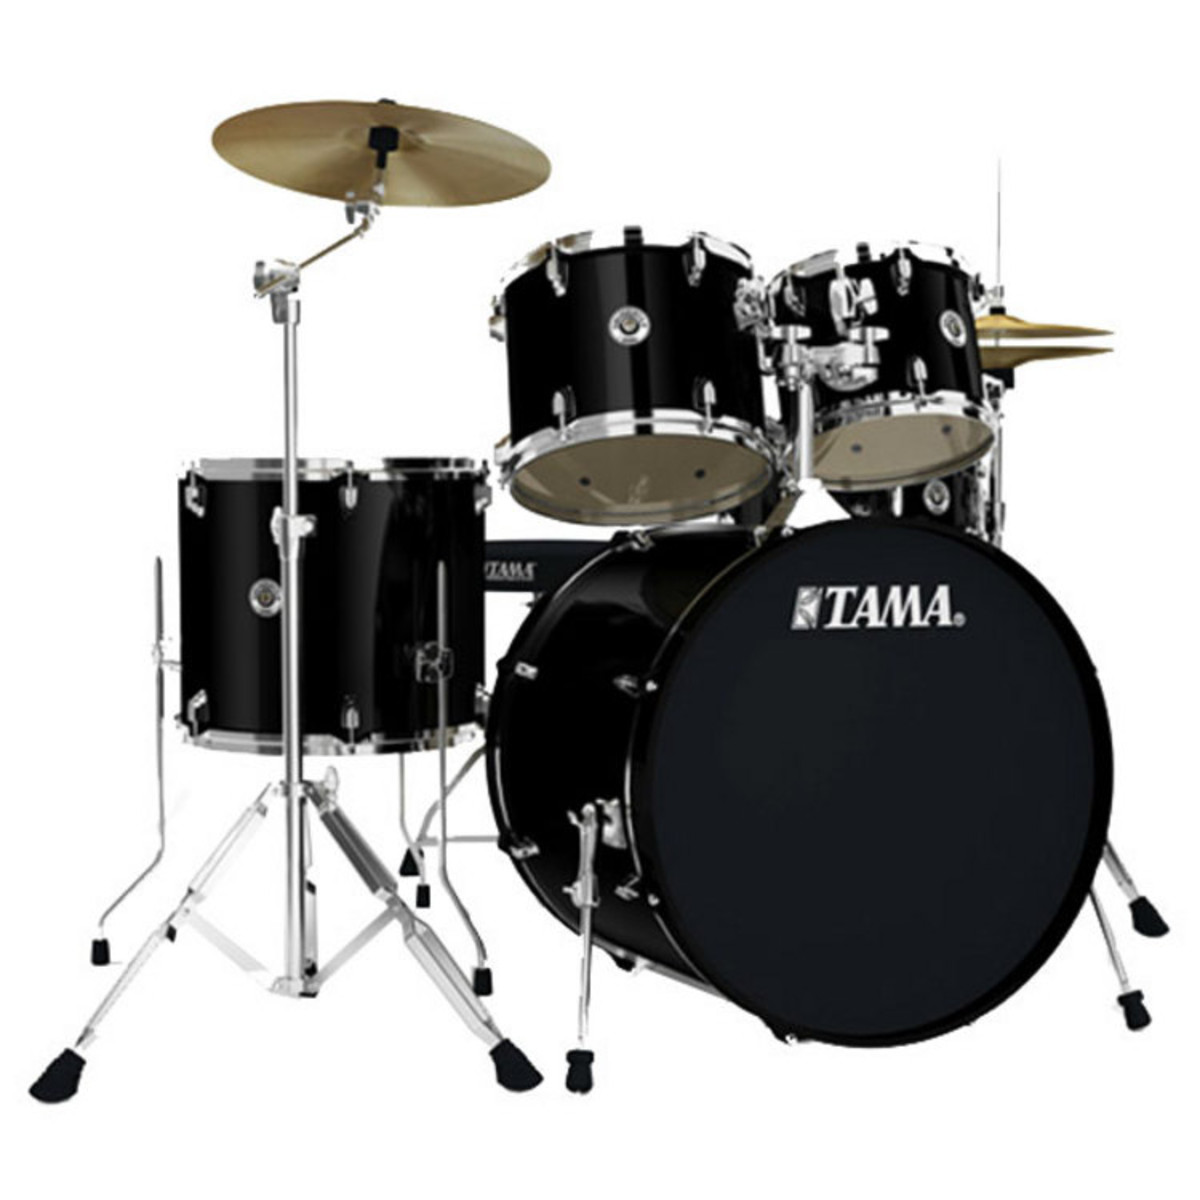 disc tama swingstar 5 piece drum kit black at. Black Bedroom Furniture Sets. Home Design Ideas